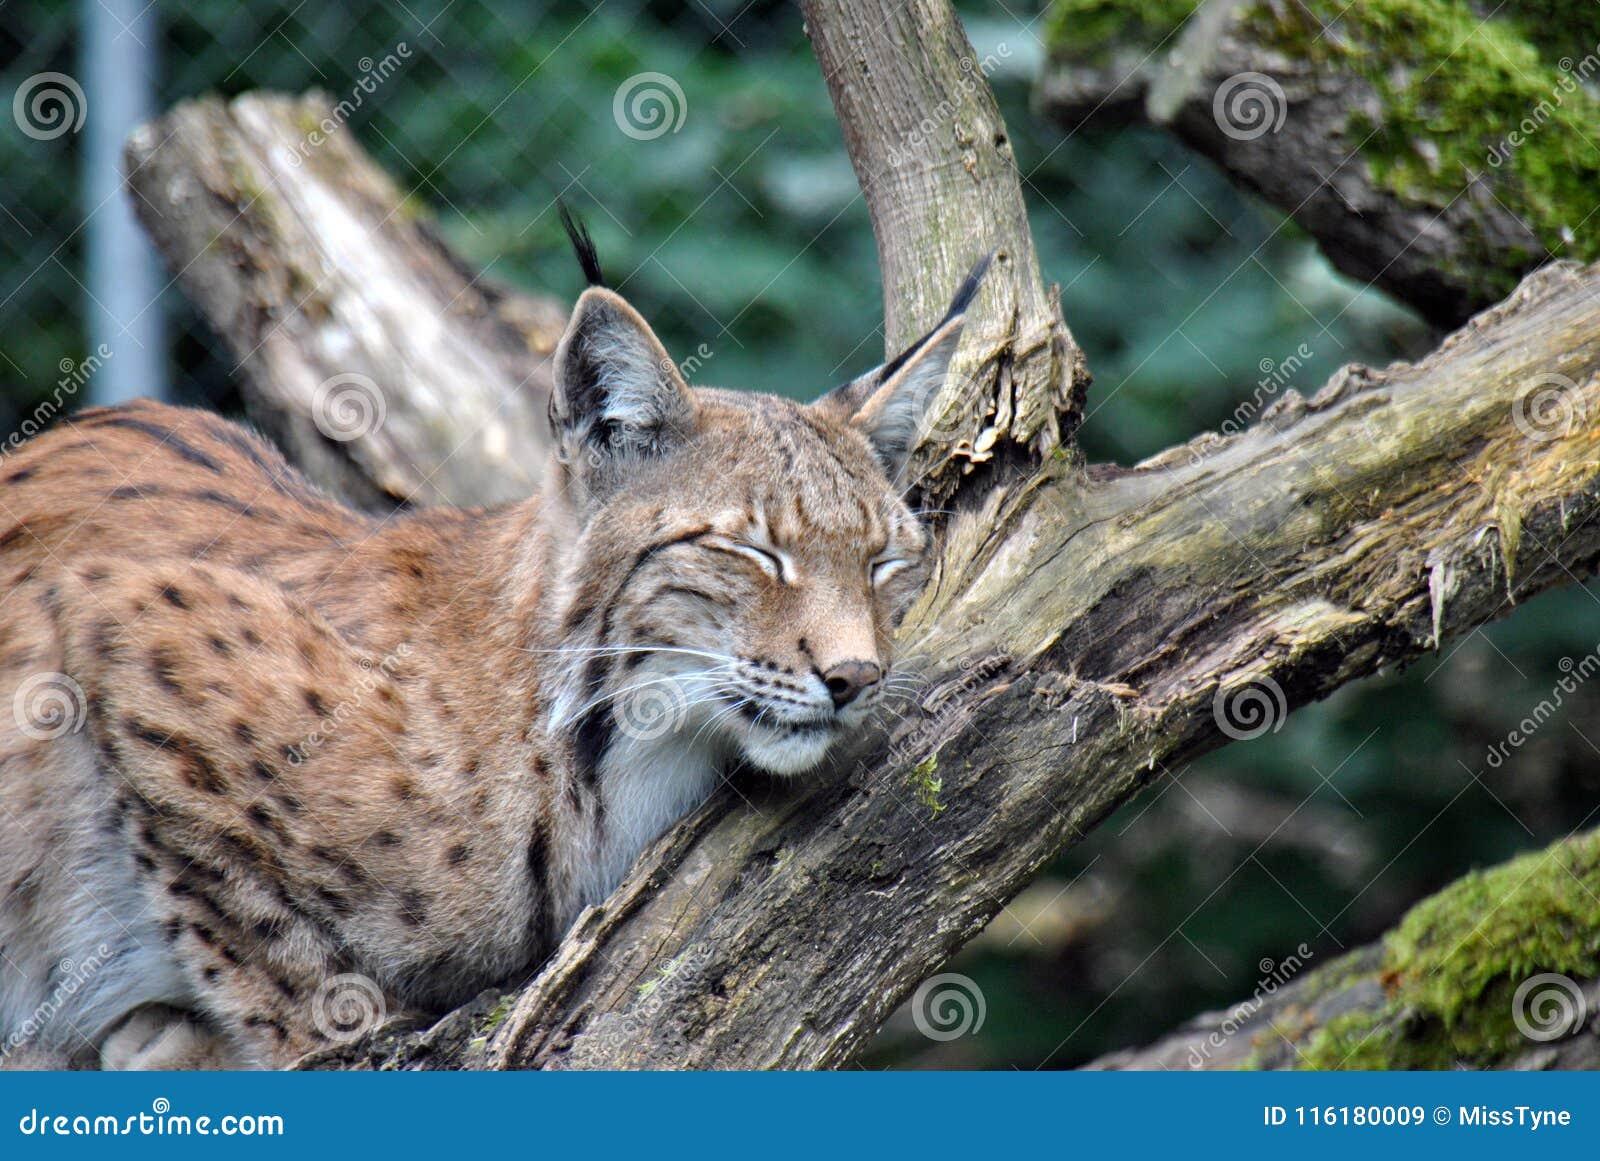 Furry and cute european lynx sleeping on a tree branch